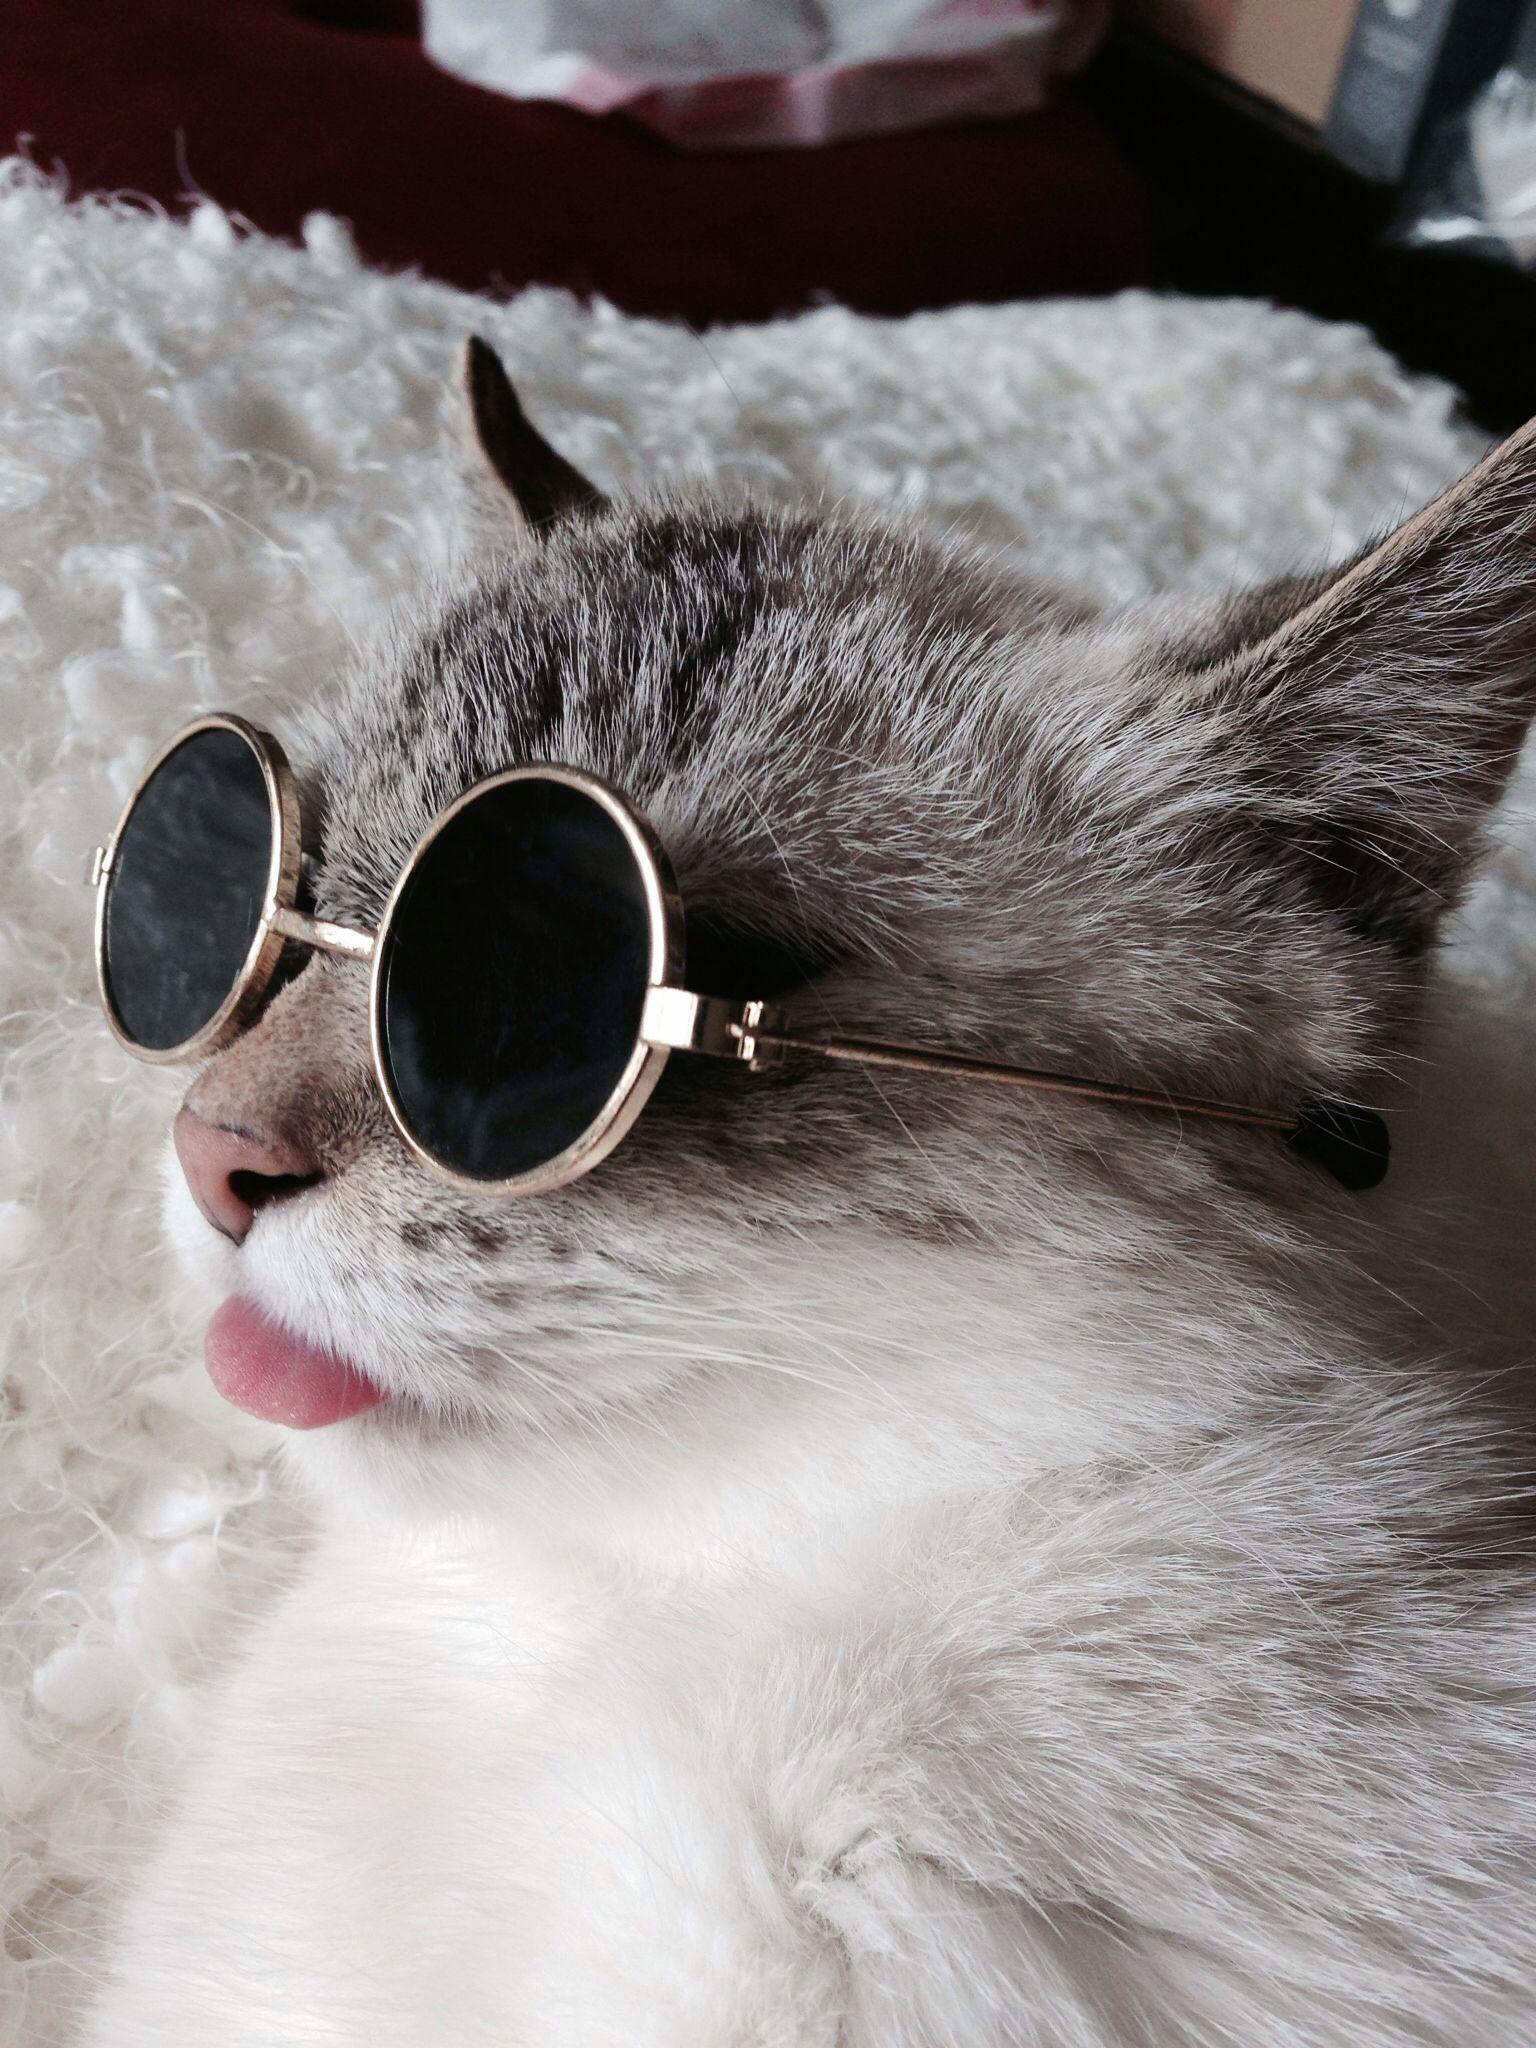 cat with dark sunglasses on